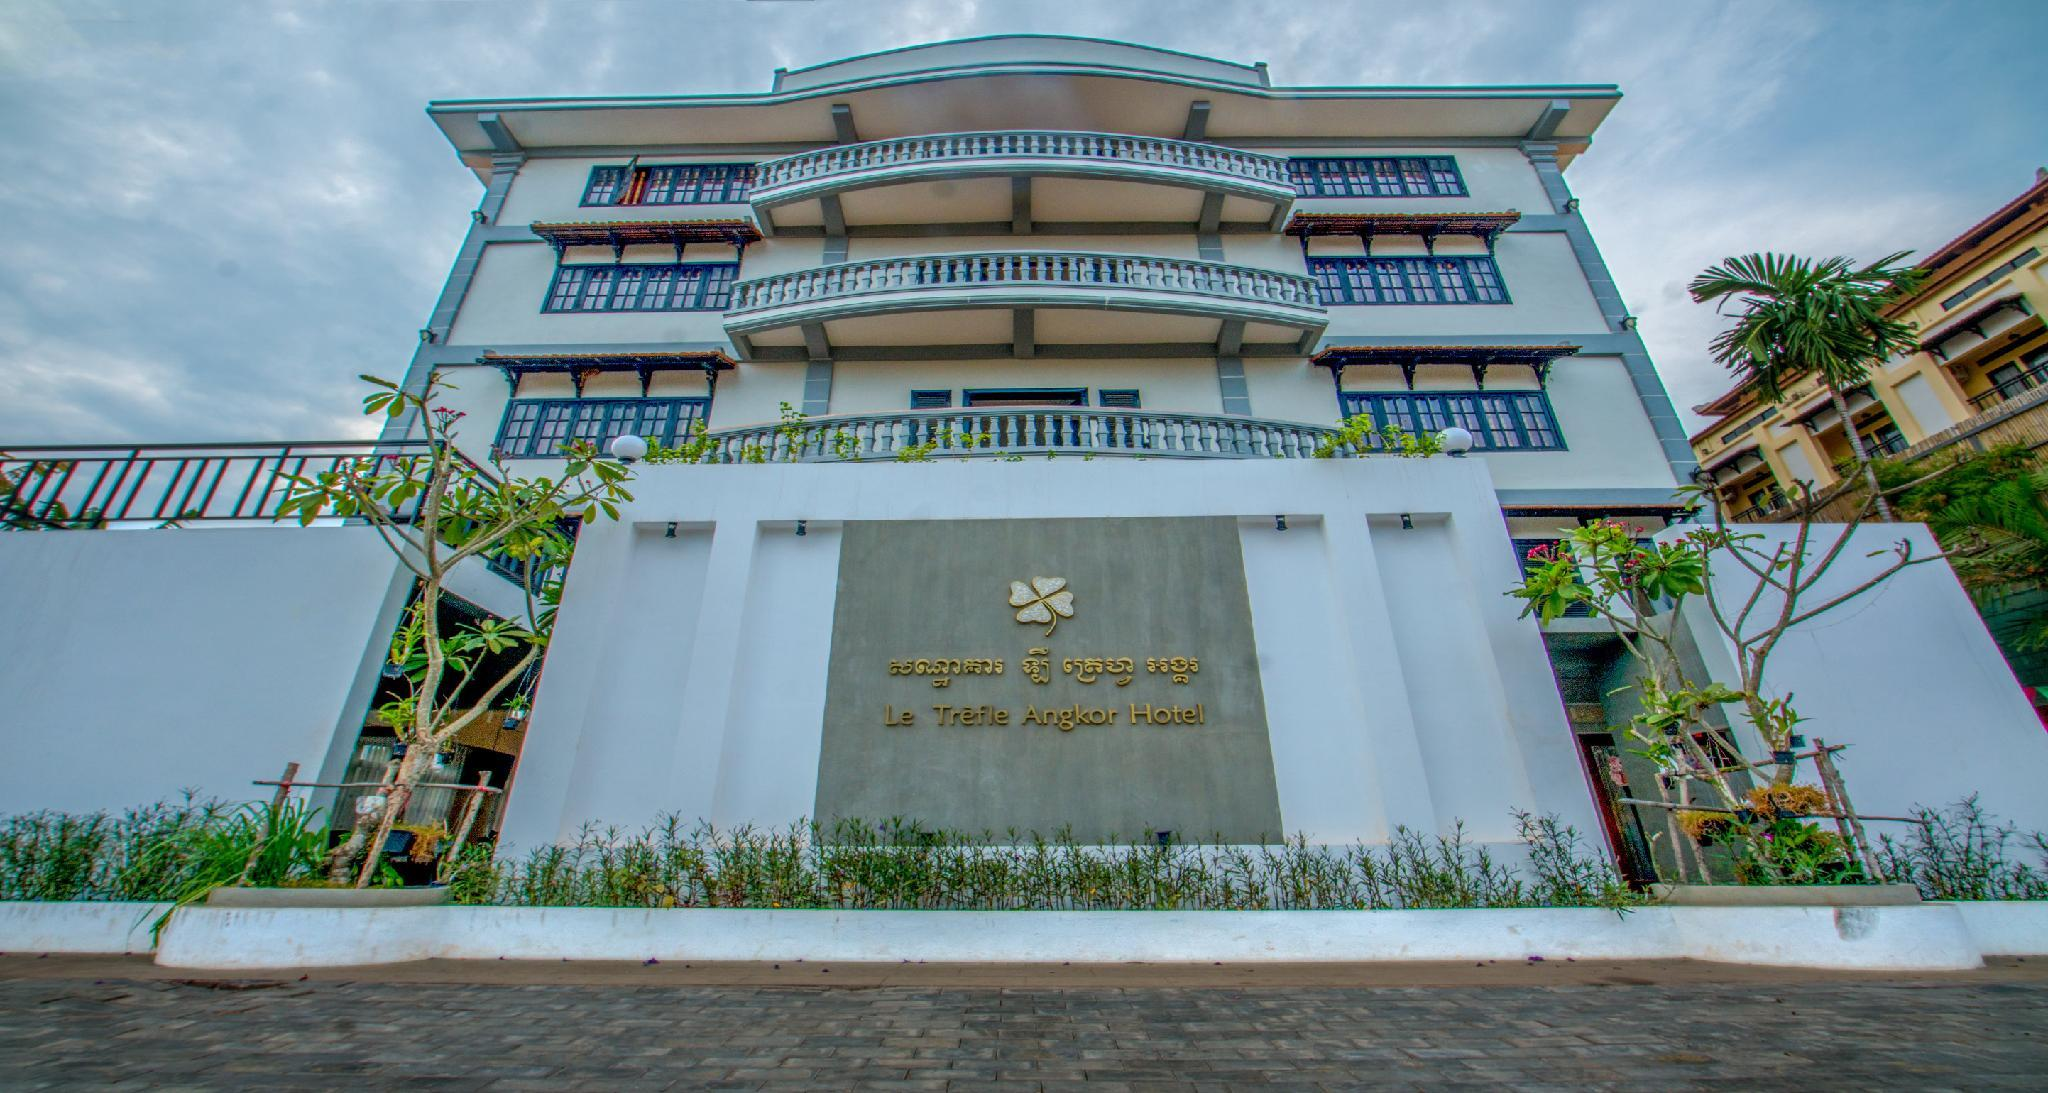 Le Trèfle Angkor Hotel